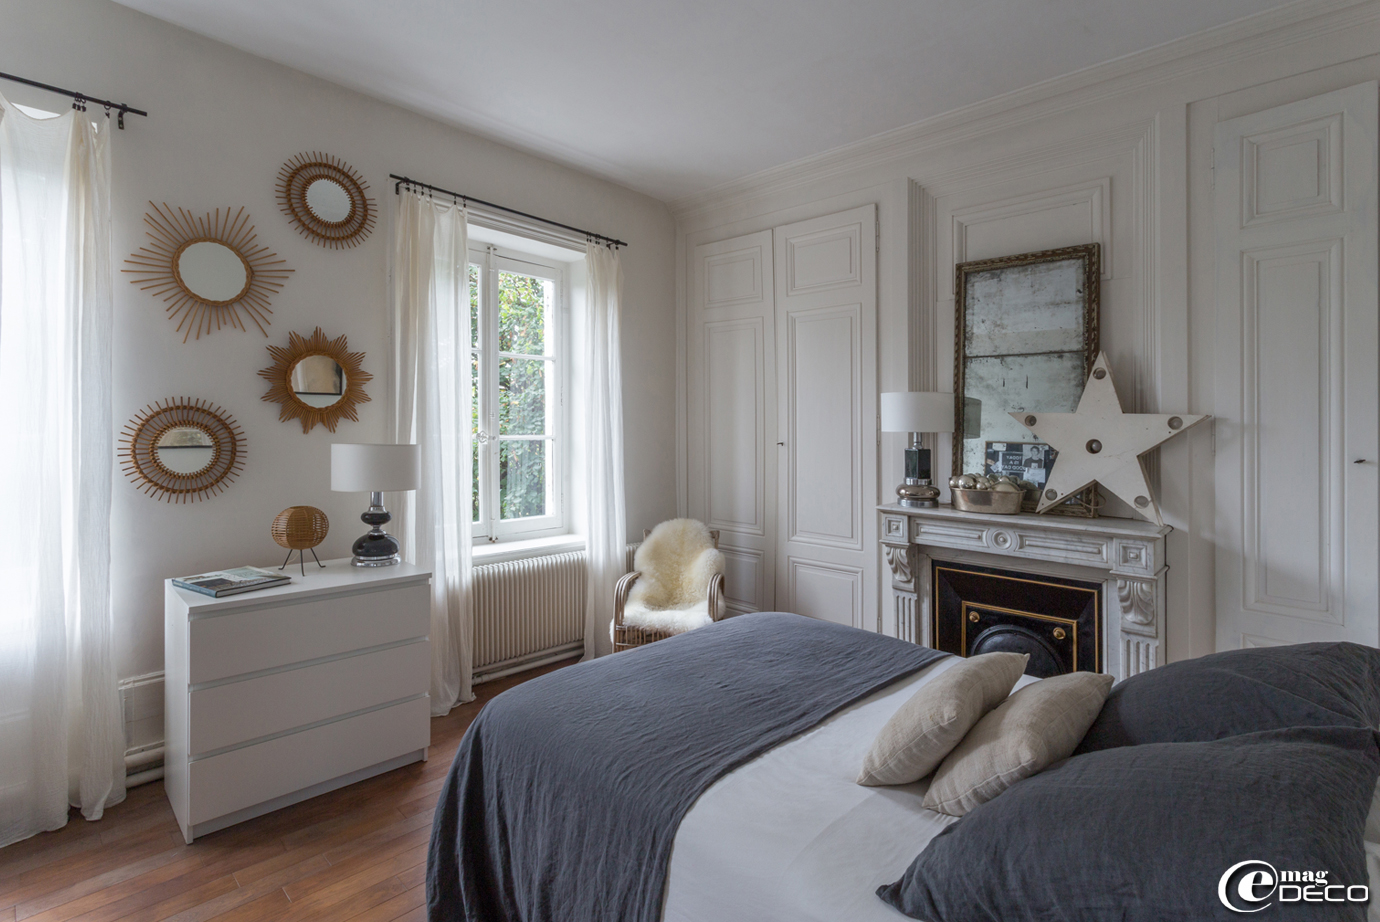 florence bouvier e magdeco magazine de d coration. Black Bedroom Furniture Sets. Home Design Ideas